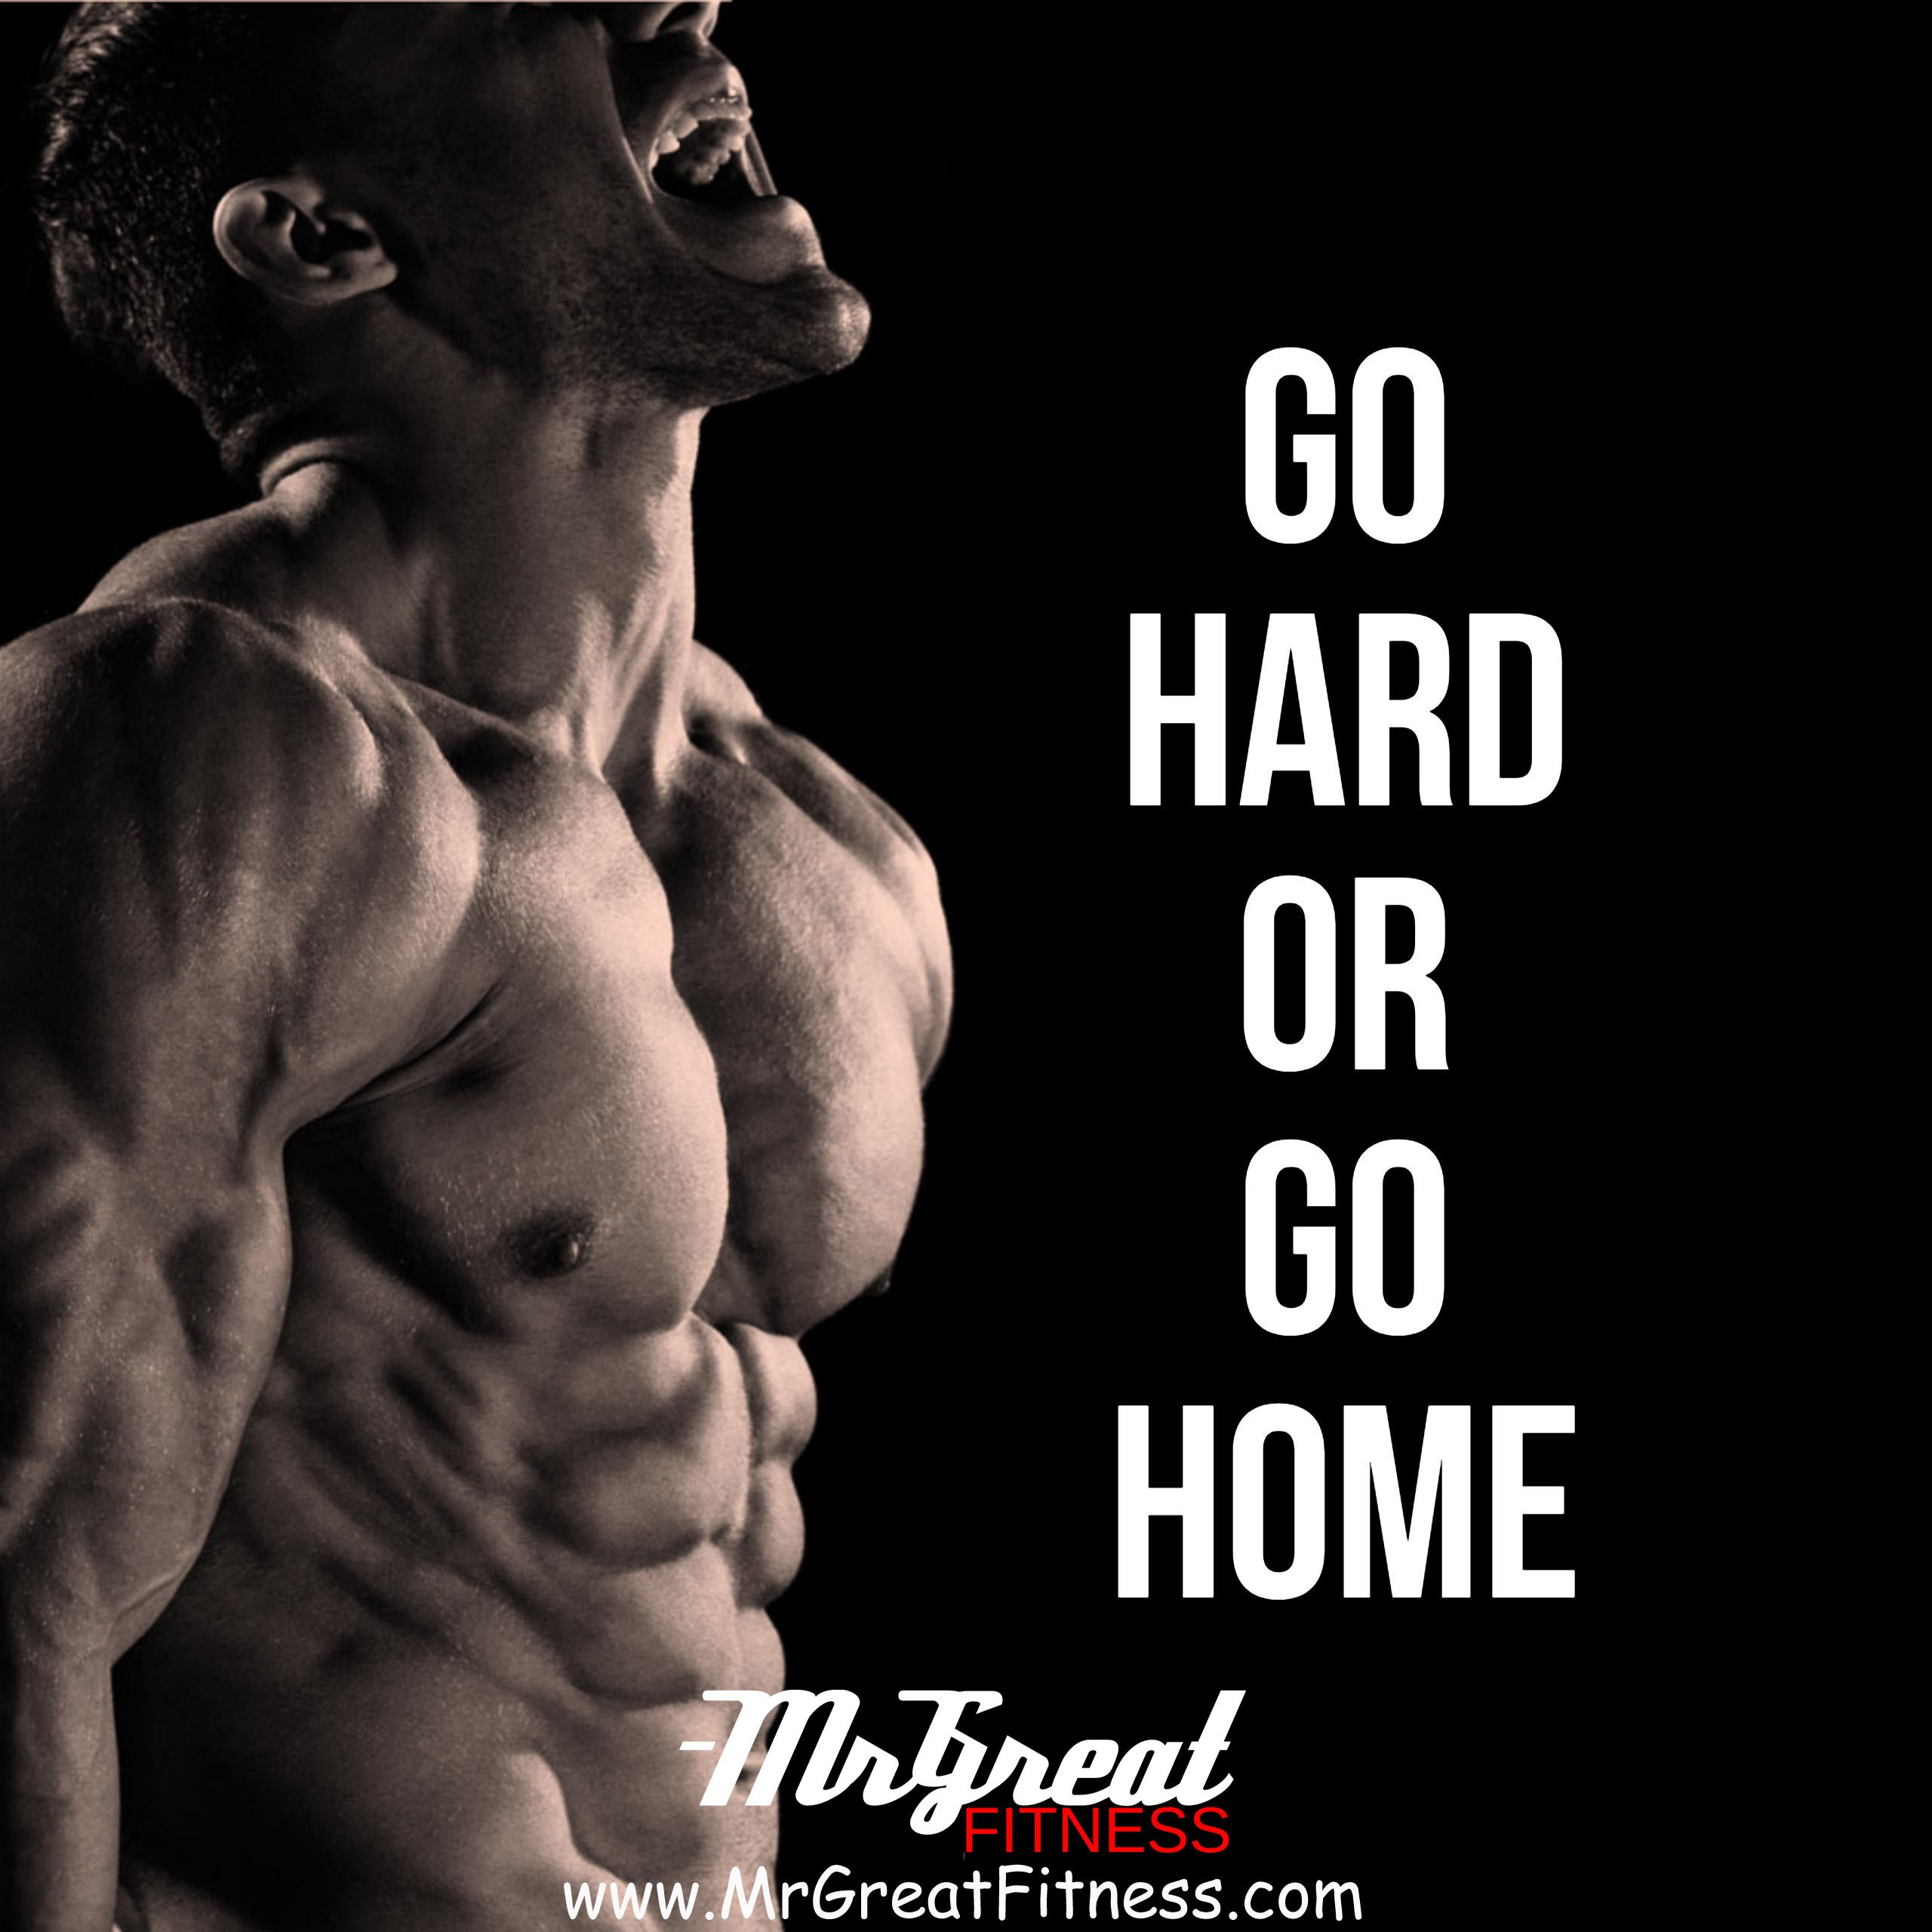 Mr Great Fitness Quotes Fitness Quotes Fitnessquotes Educacao Fisica Homens Bonitos Treino